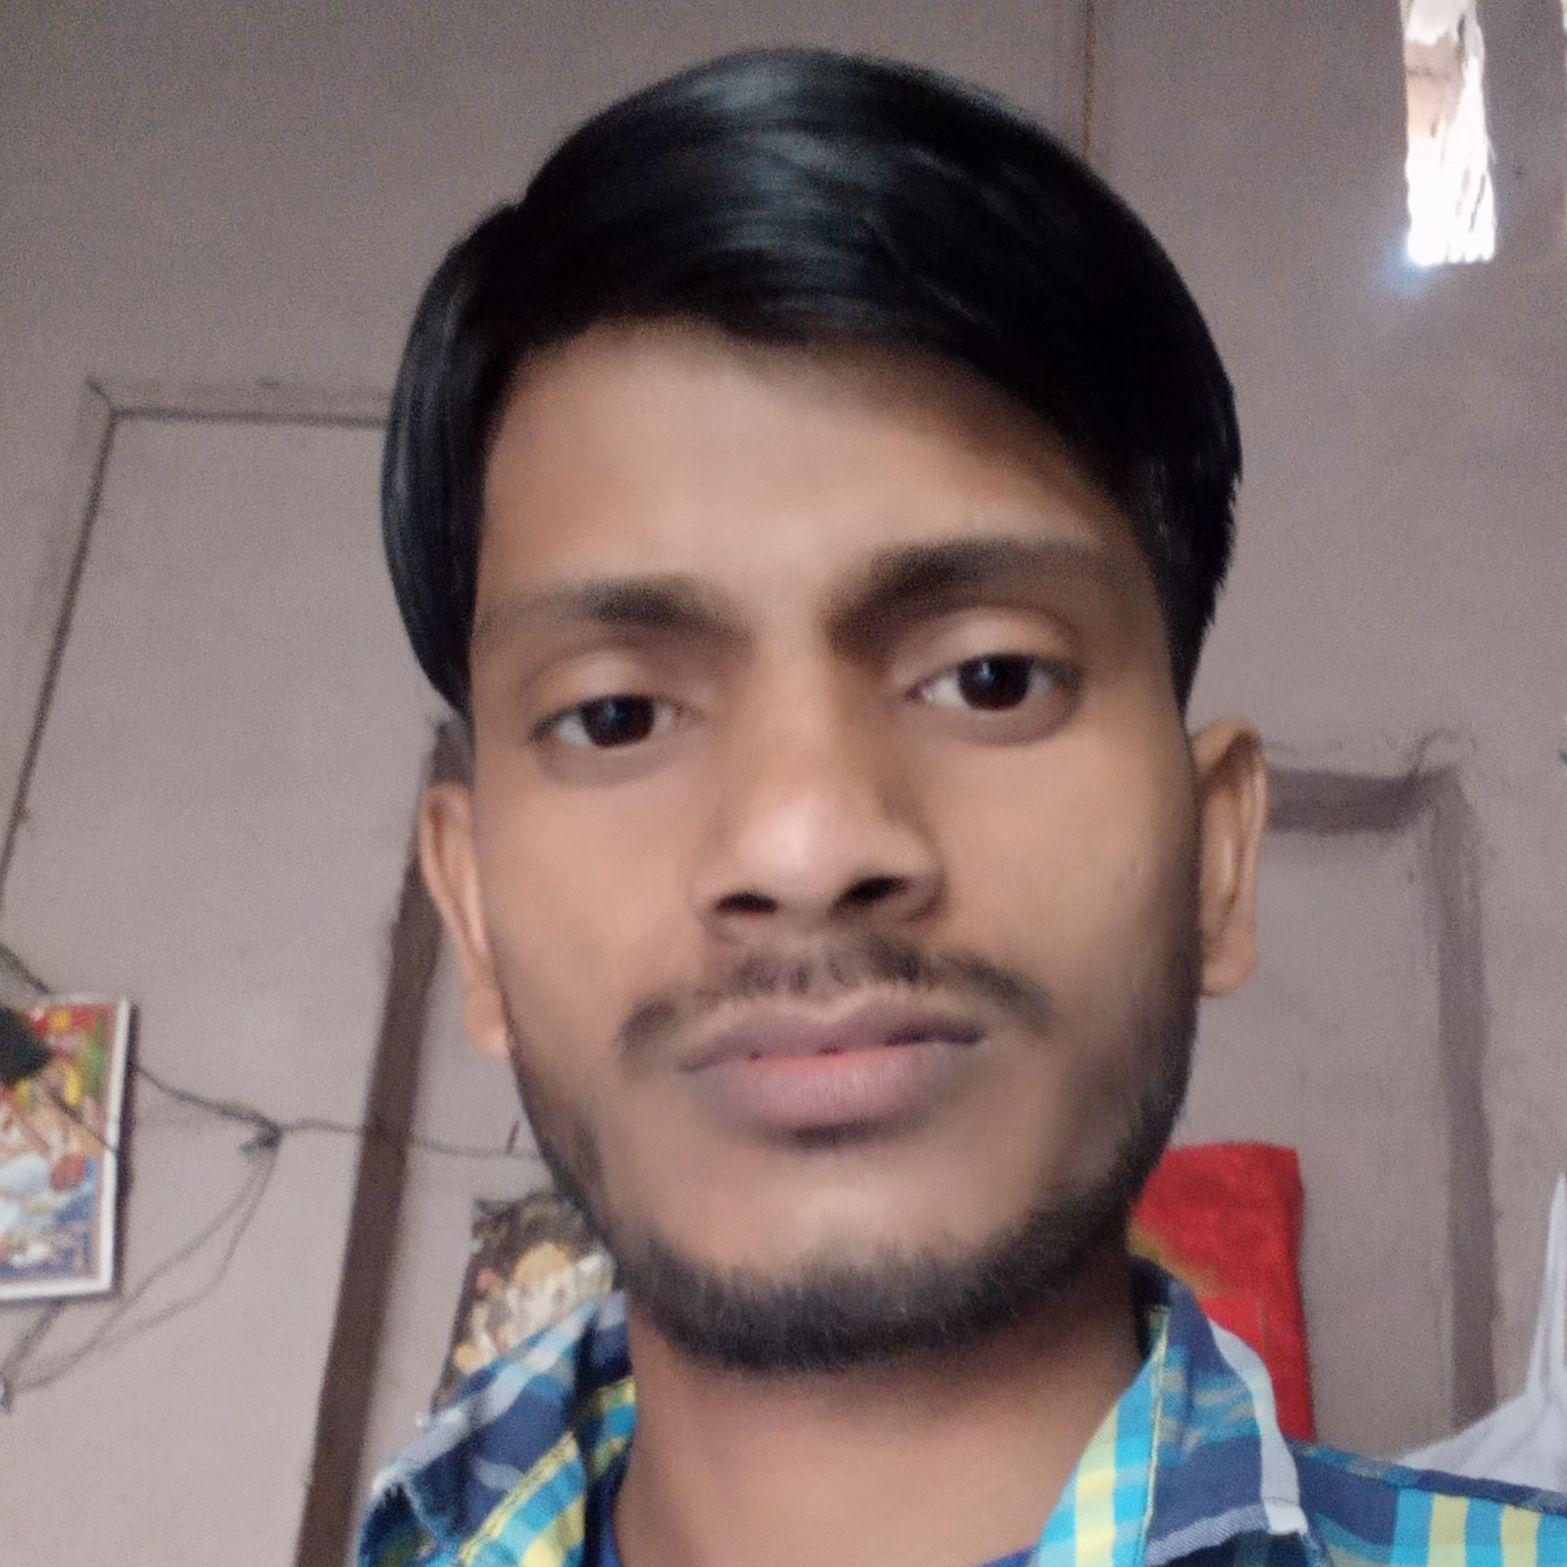 Chhote Lal Yadav